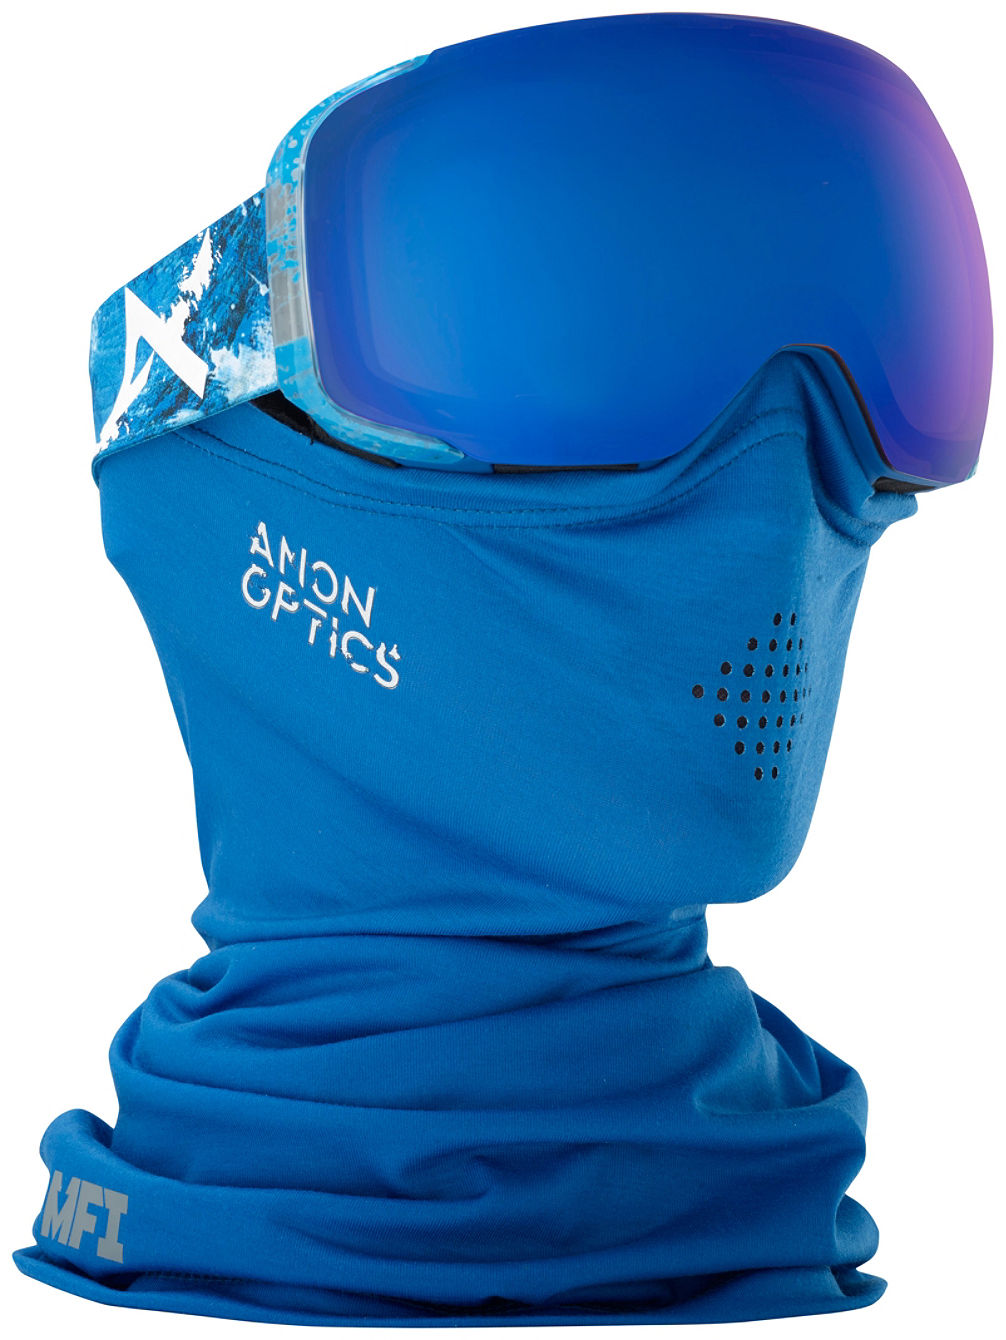 Charmant Anon M2 MFI Hiker Blue (+Facemask U0026 Bonus Len Goggle Online Kaufen Bei Blue  Tomato